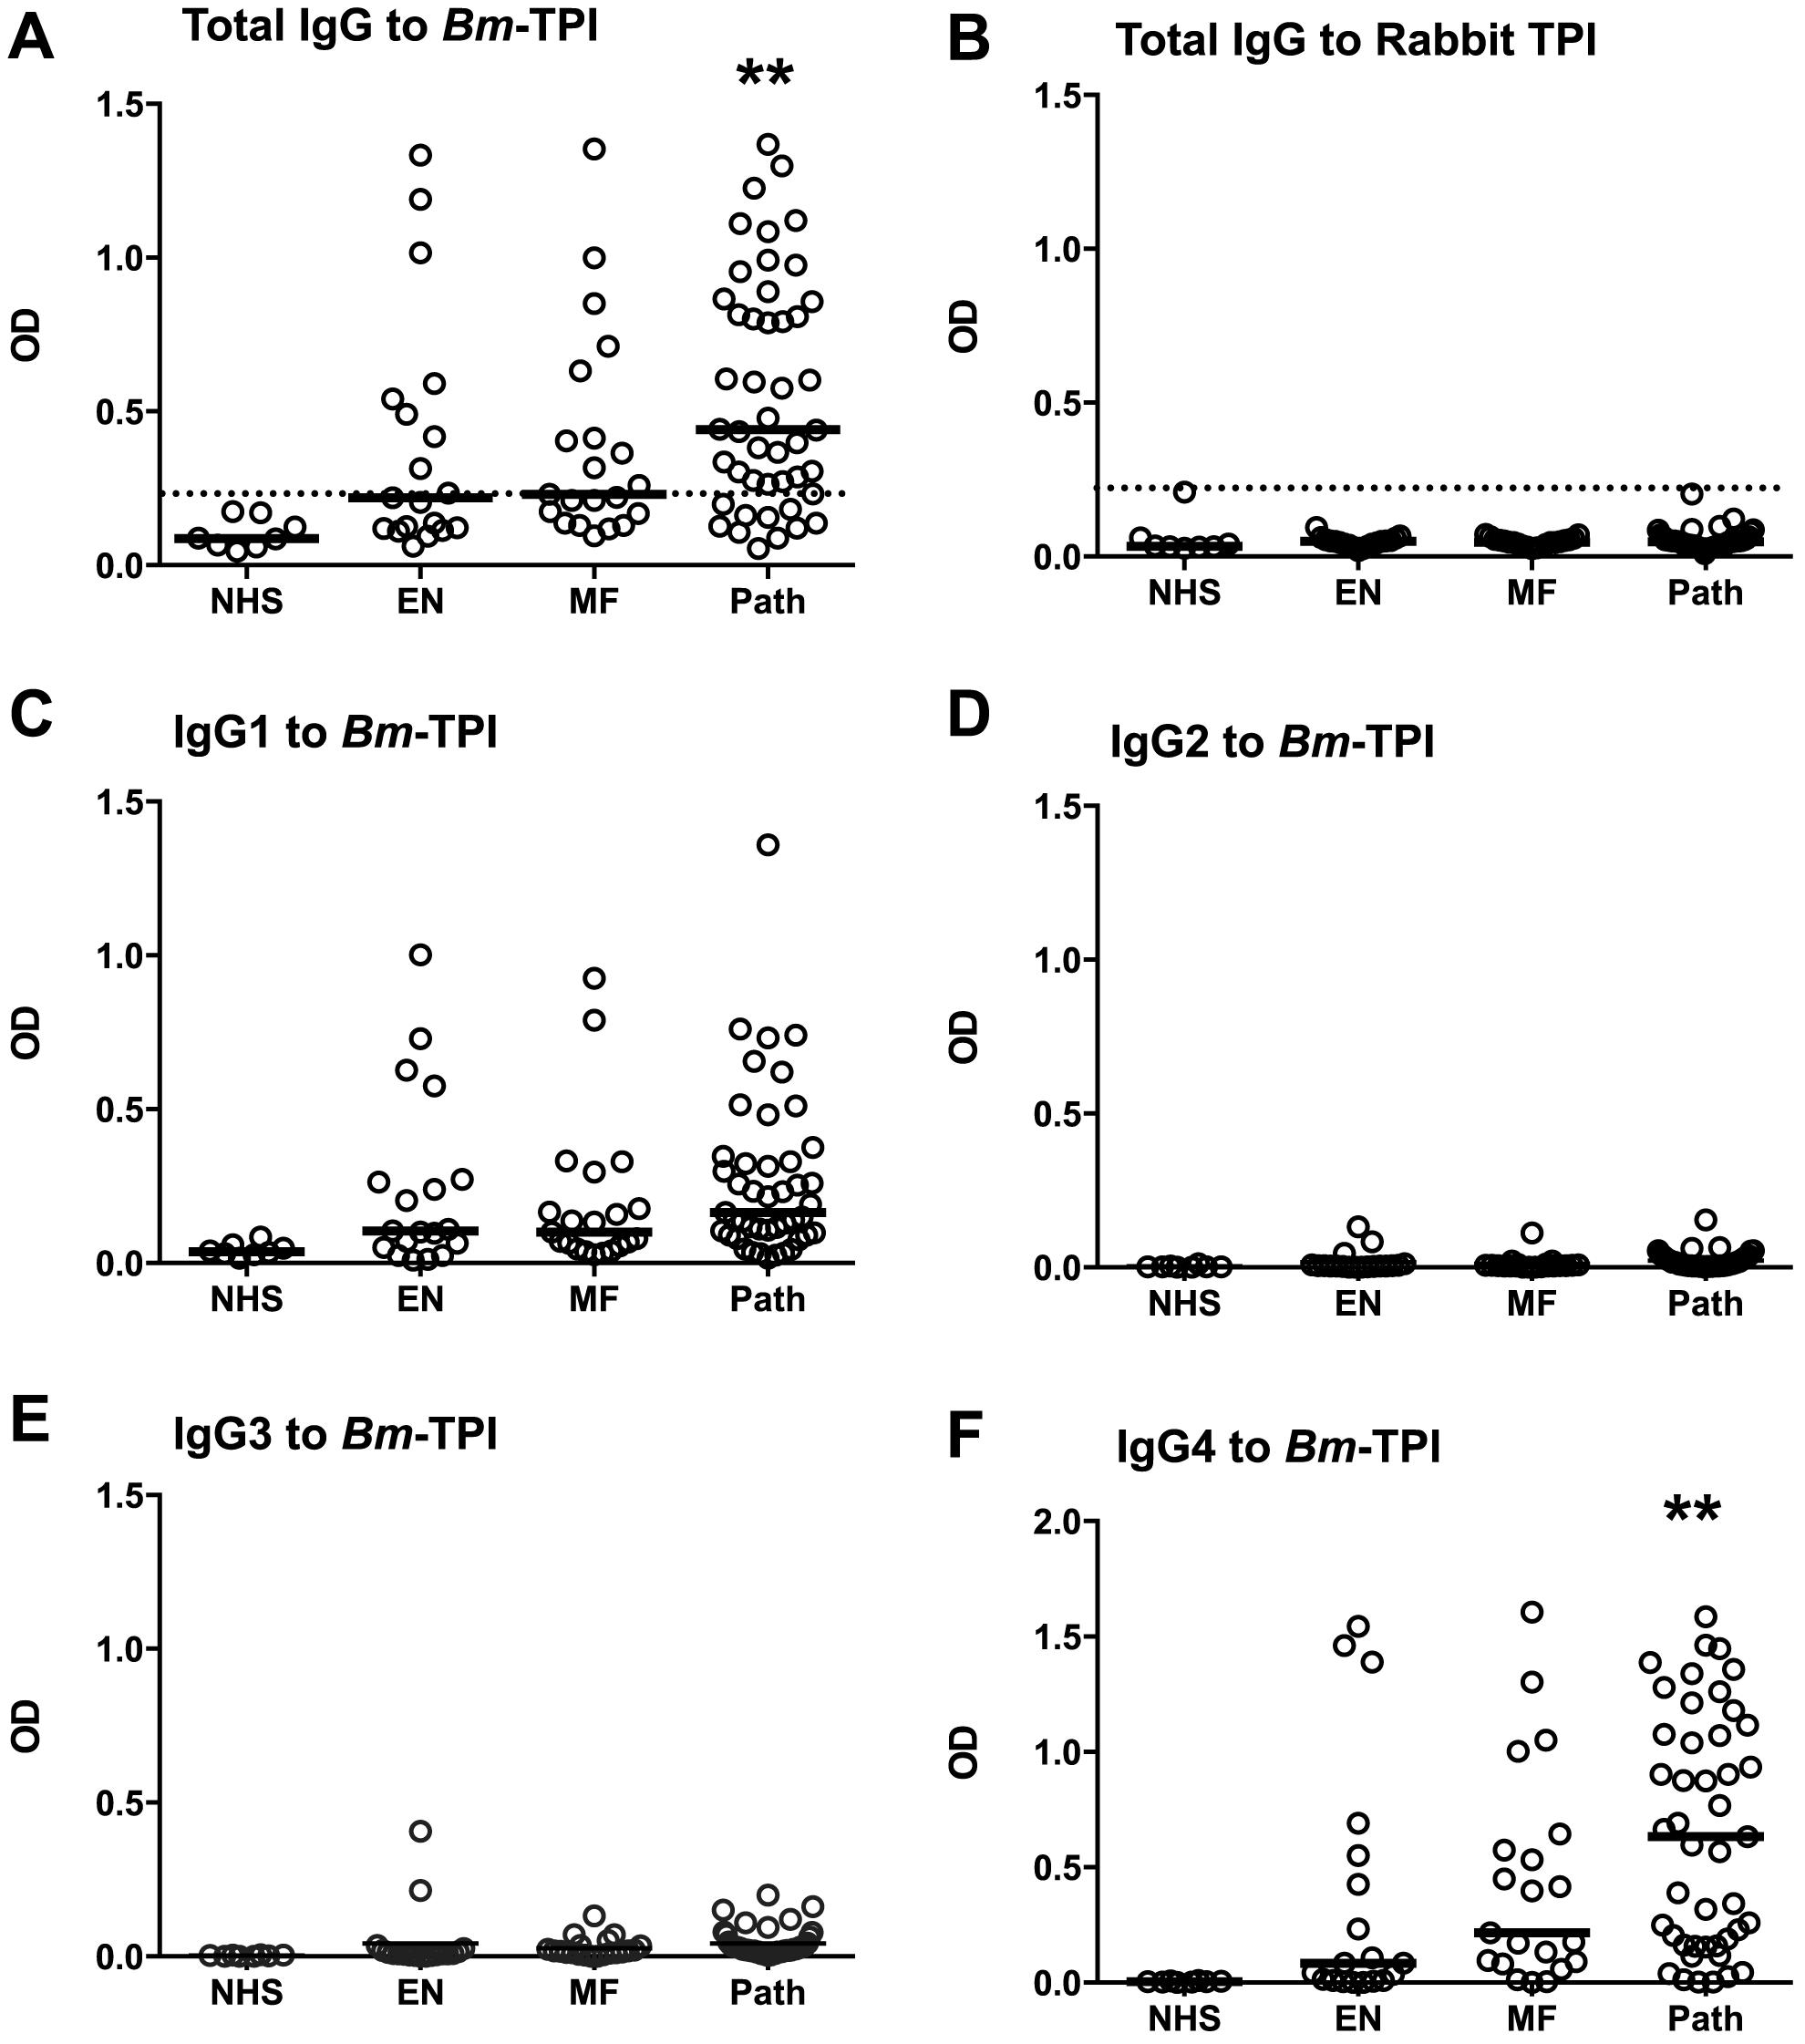 Anti-<i>Bm</i>-TPI antibody levels in <i>B. malayi</i>-infected human filariasis patients.